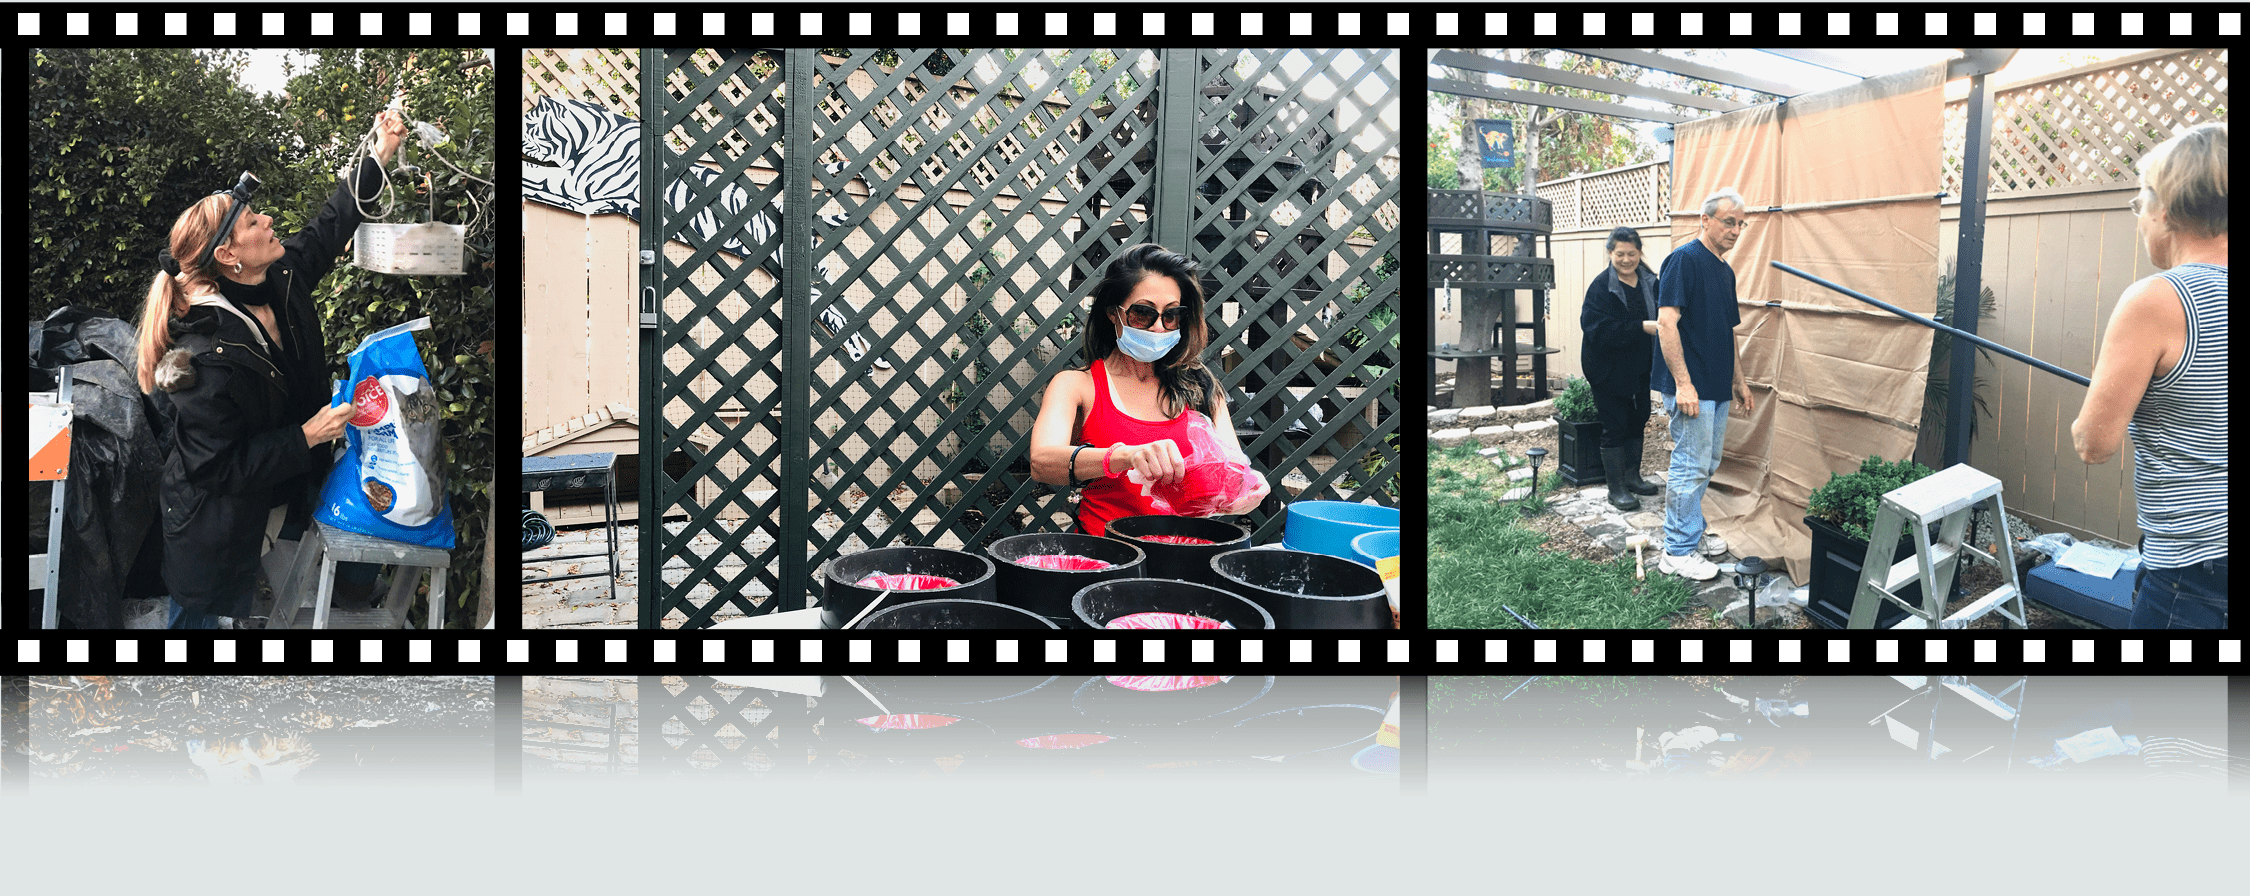 Filmstrip - Shanti's House Action Shots 2